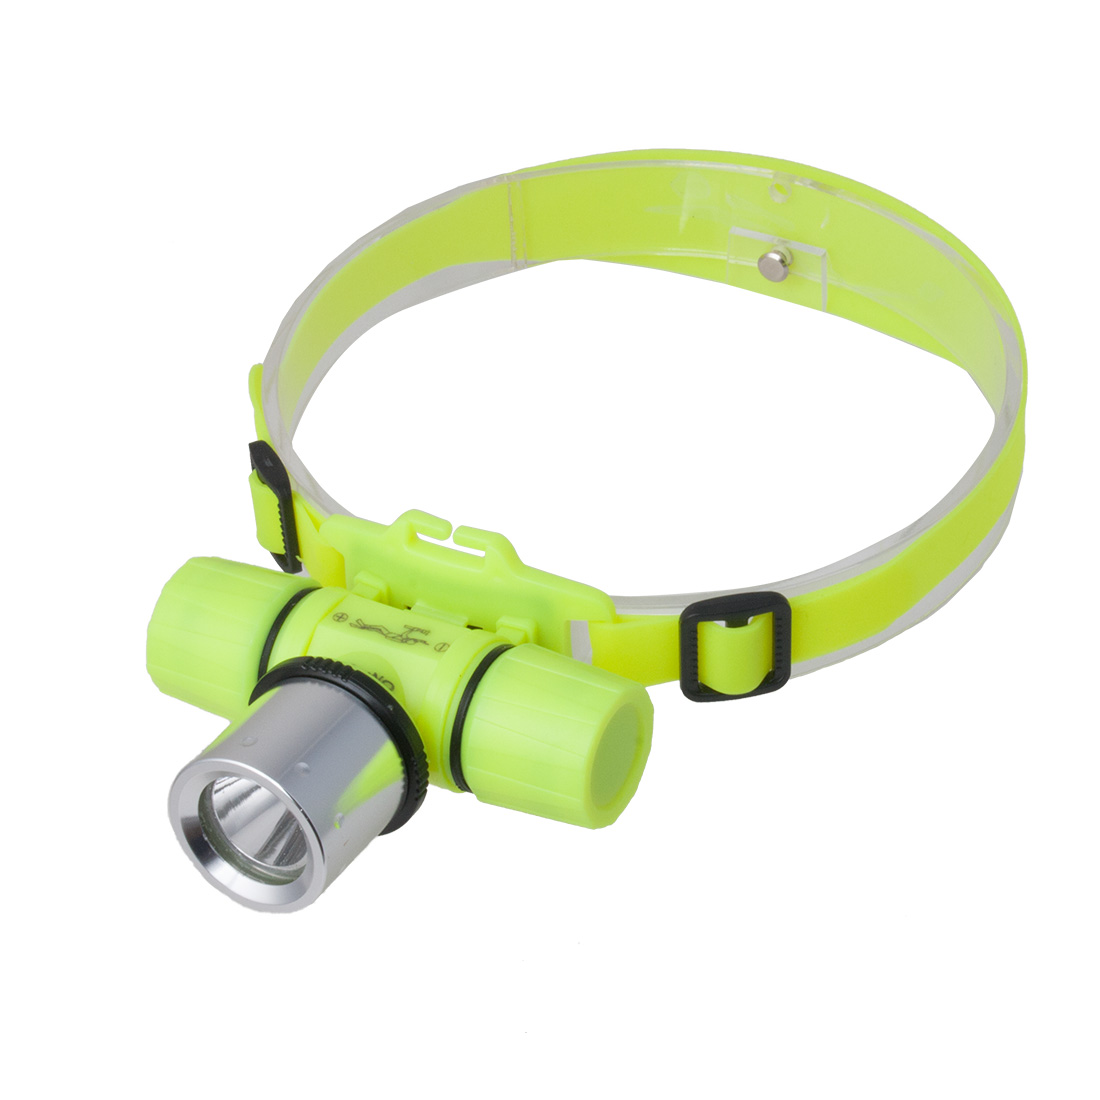 Diving LED Headlamp Swimming Waterproof Headlight Torch Lamp Dive Light 3 Modes